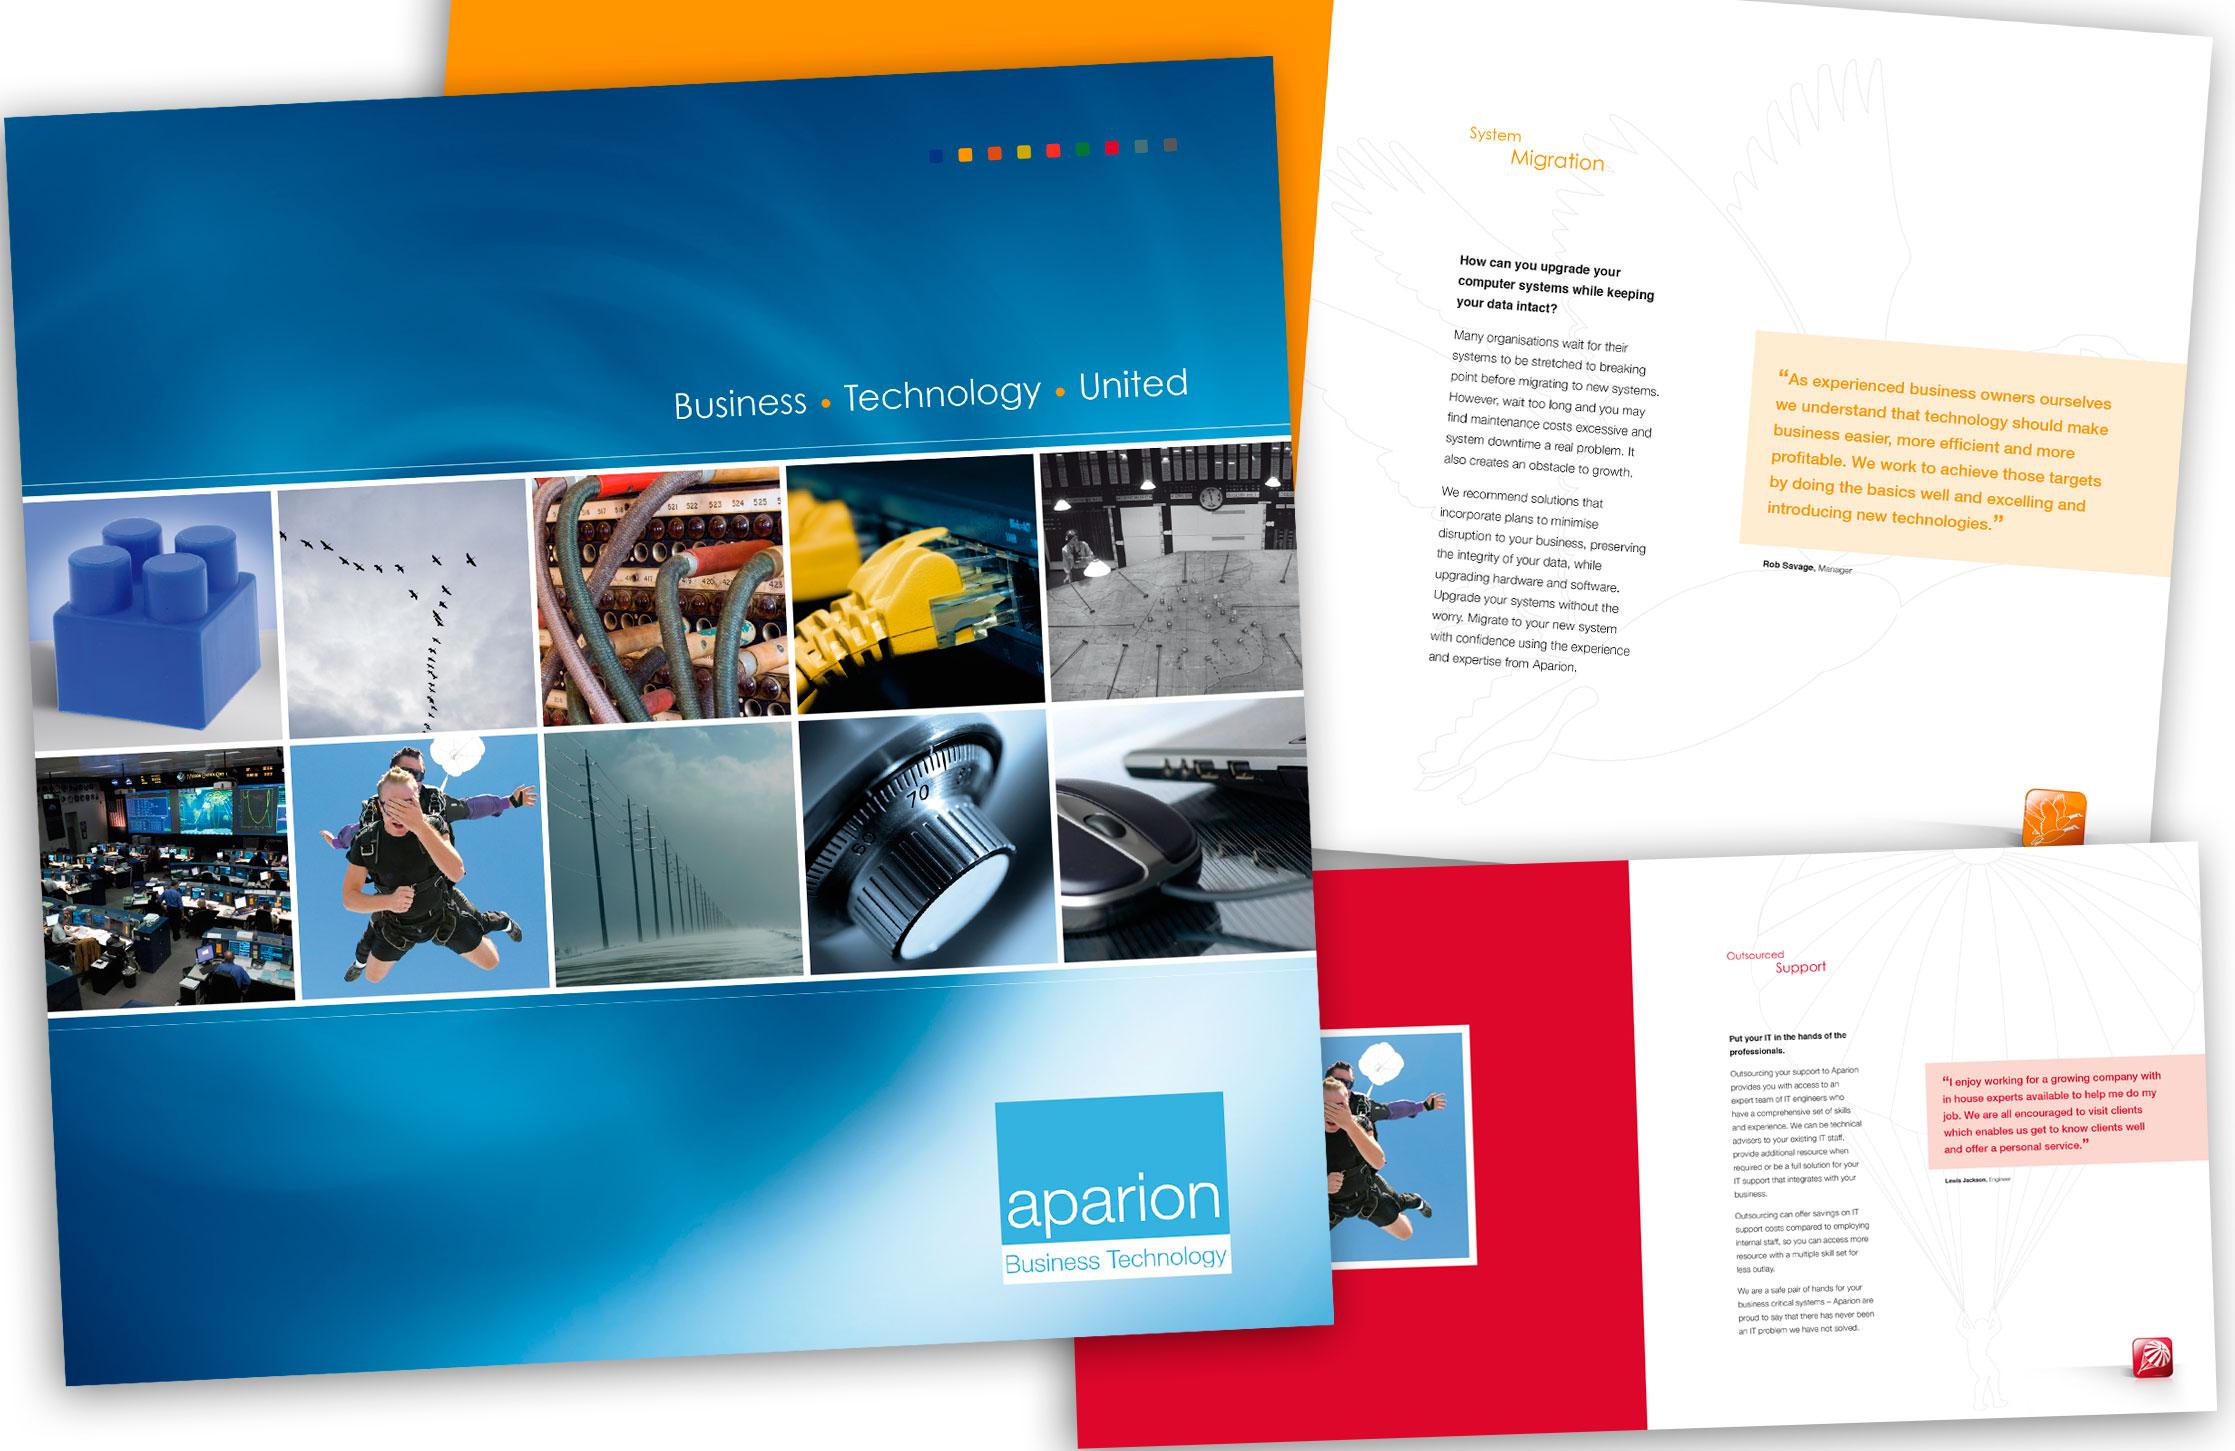 Aparion Brochure